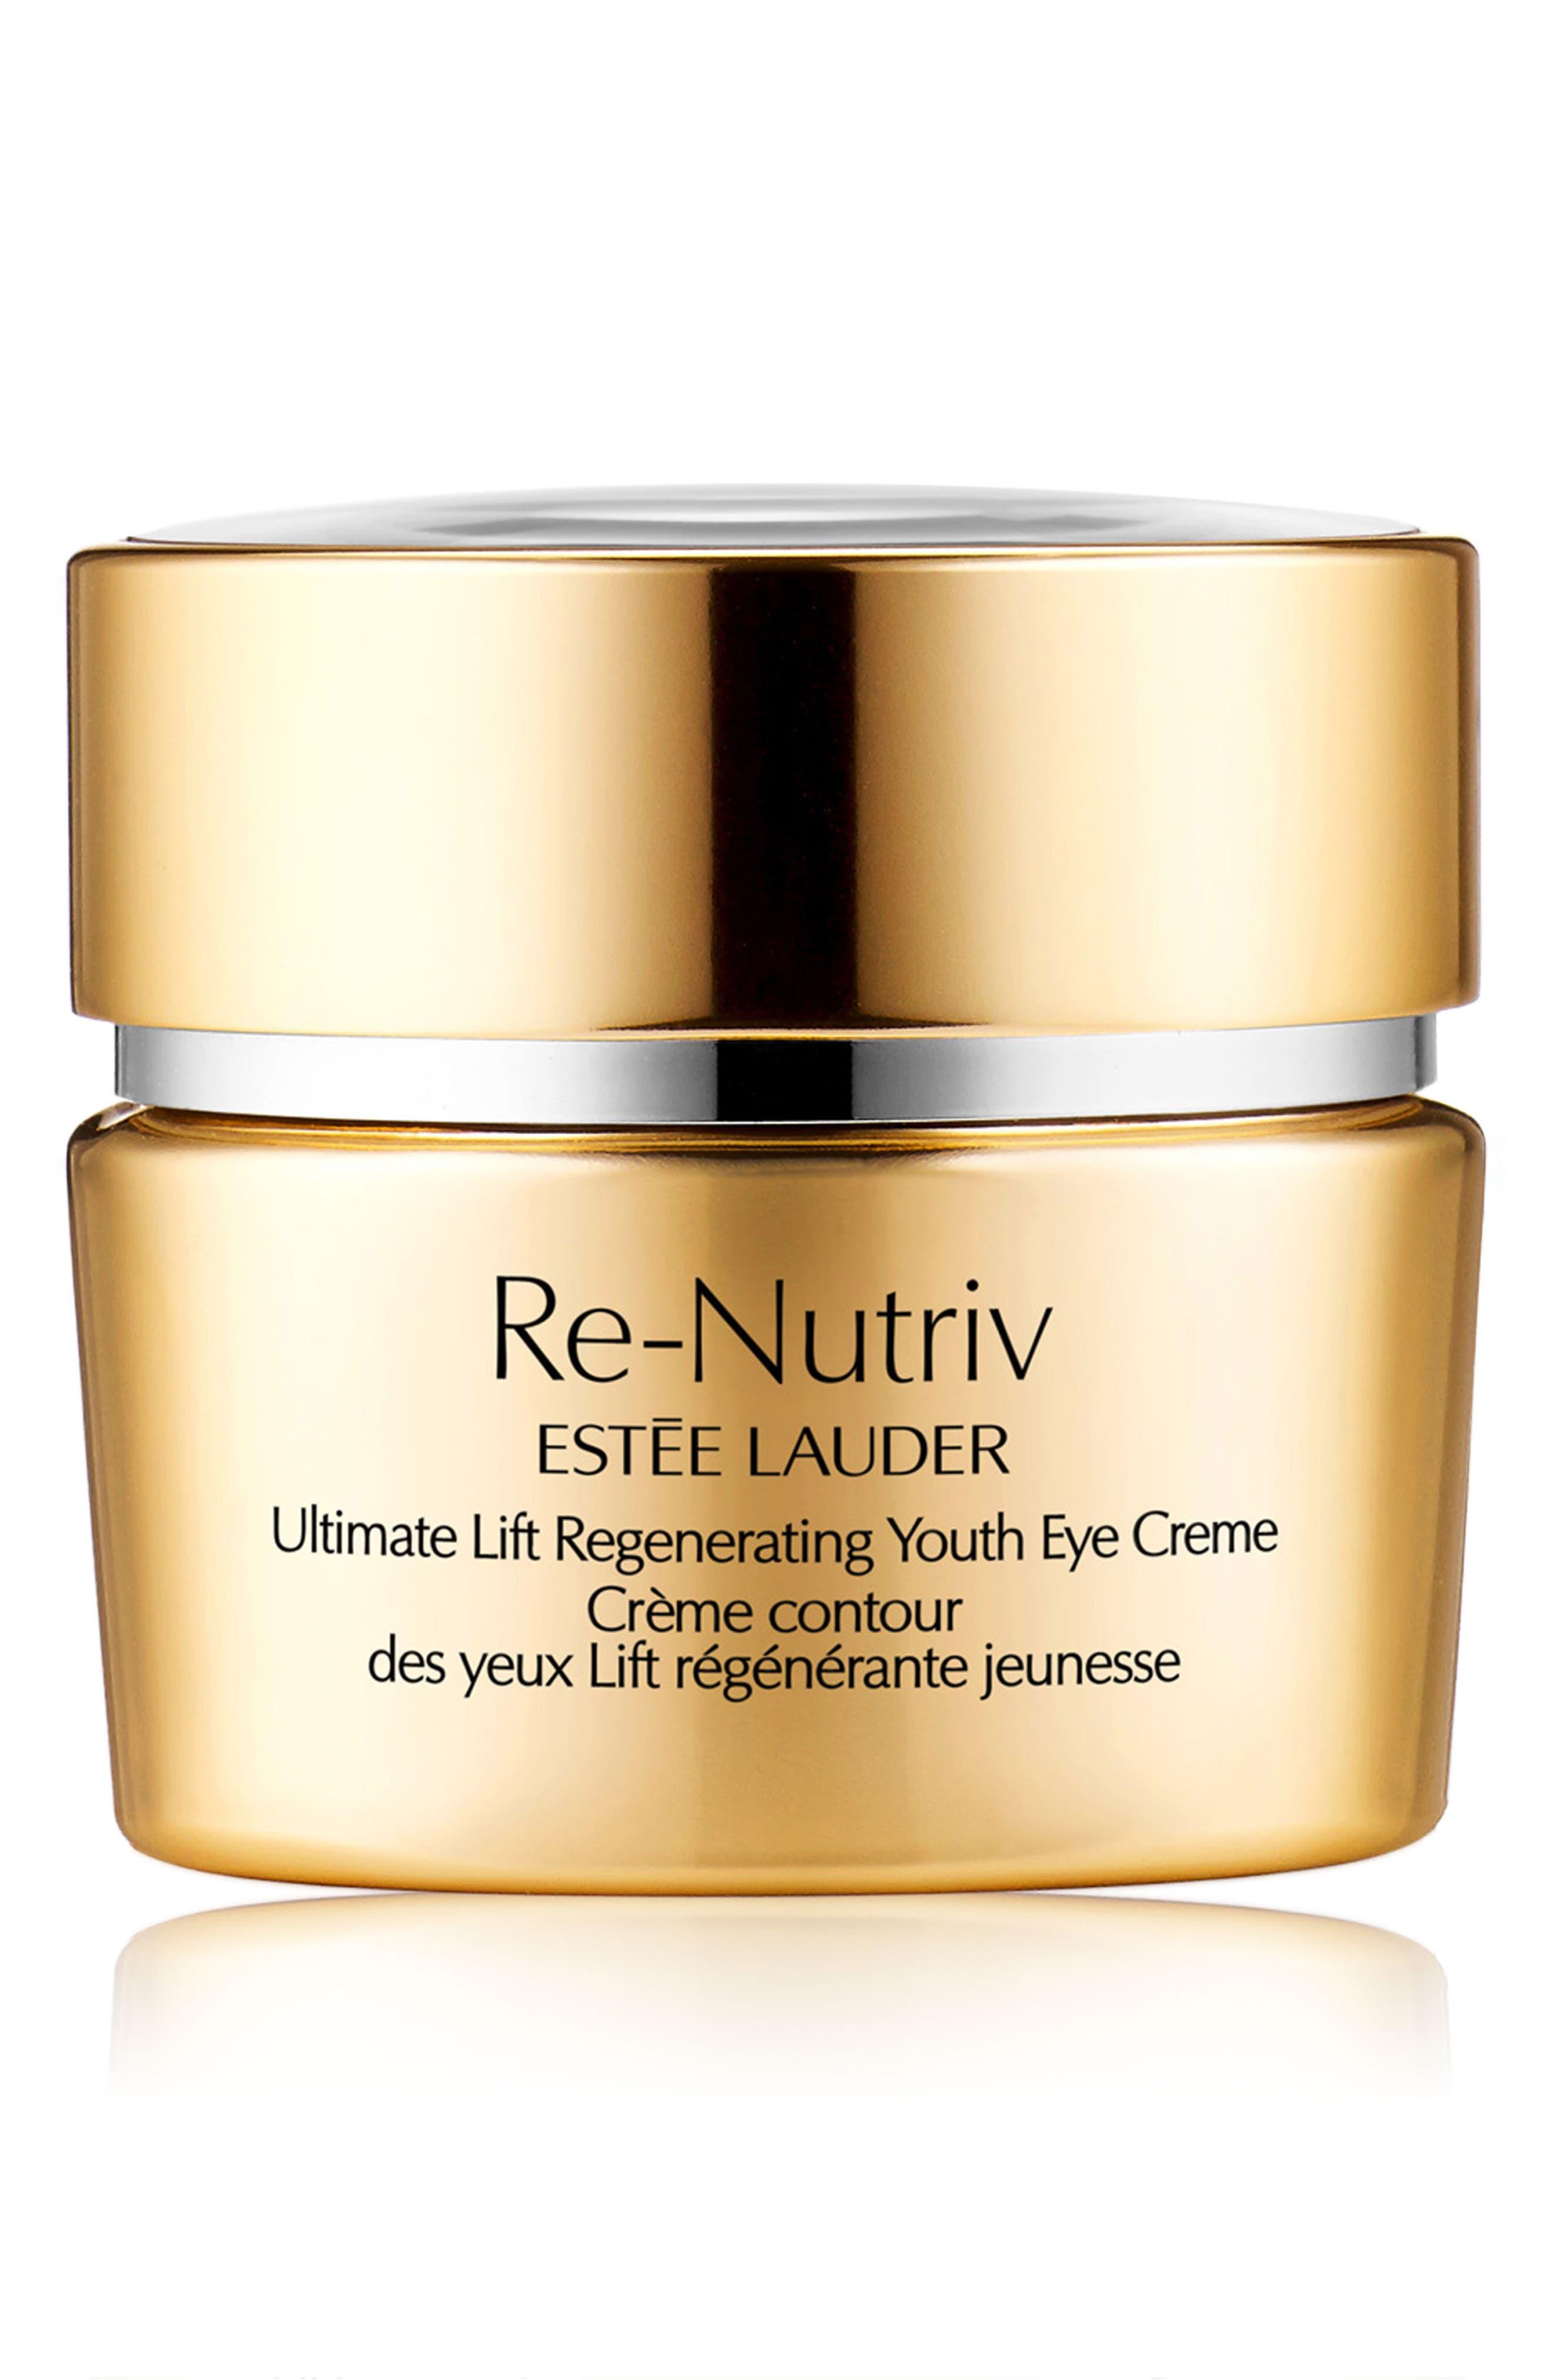 Re-Nutriv Ultimate Lift Regenerating Youth Eye Creme,                             Main thumbnail 1, color,                             NO COLOR